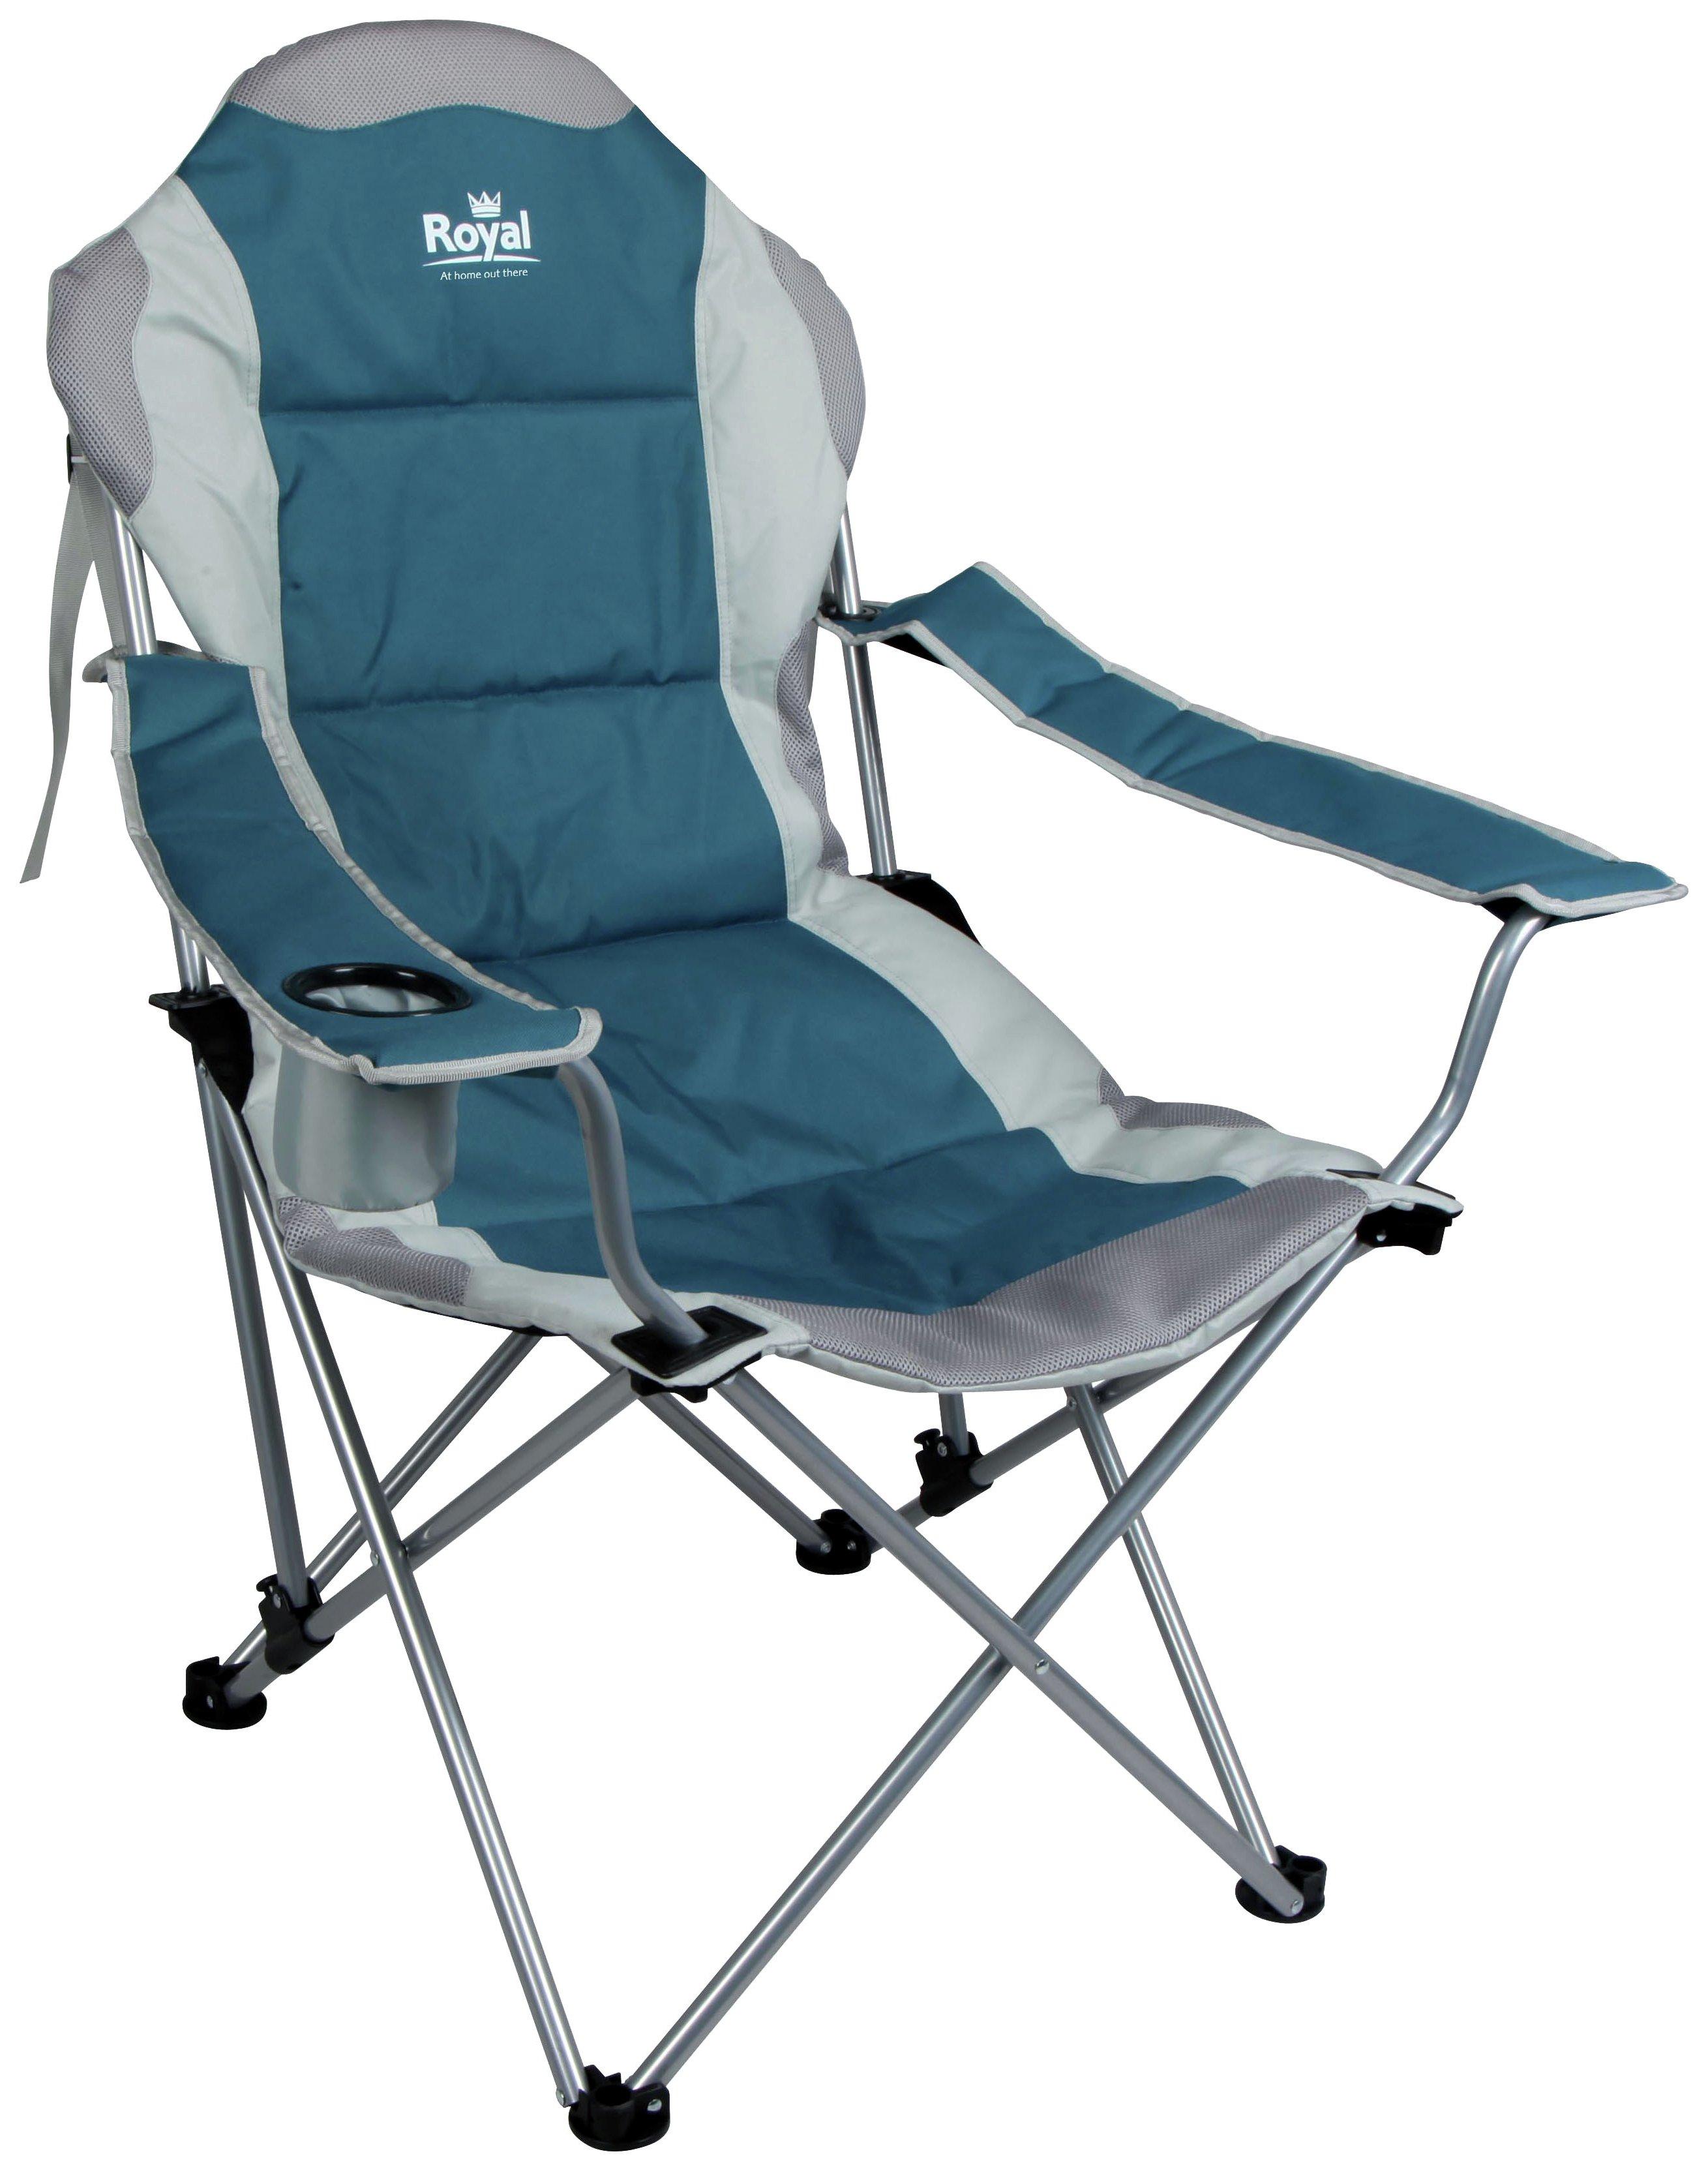 royal adjustable chair review. Black Bedroom Furniture Sets. Home Design Ideas